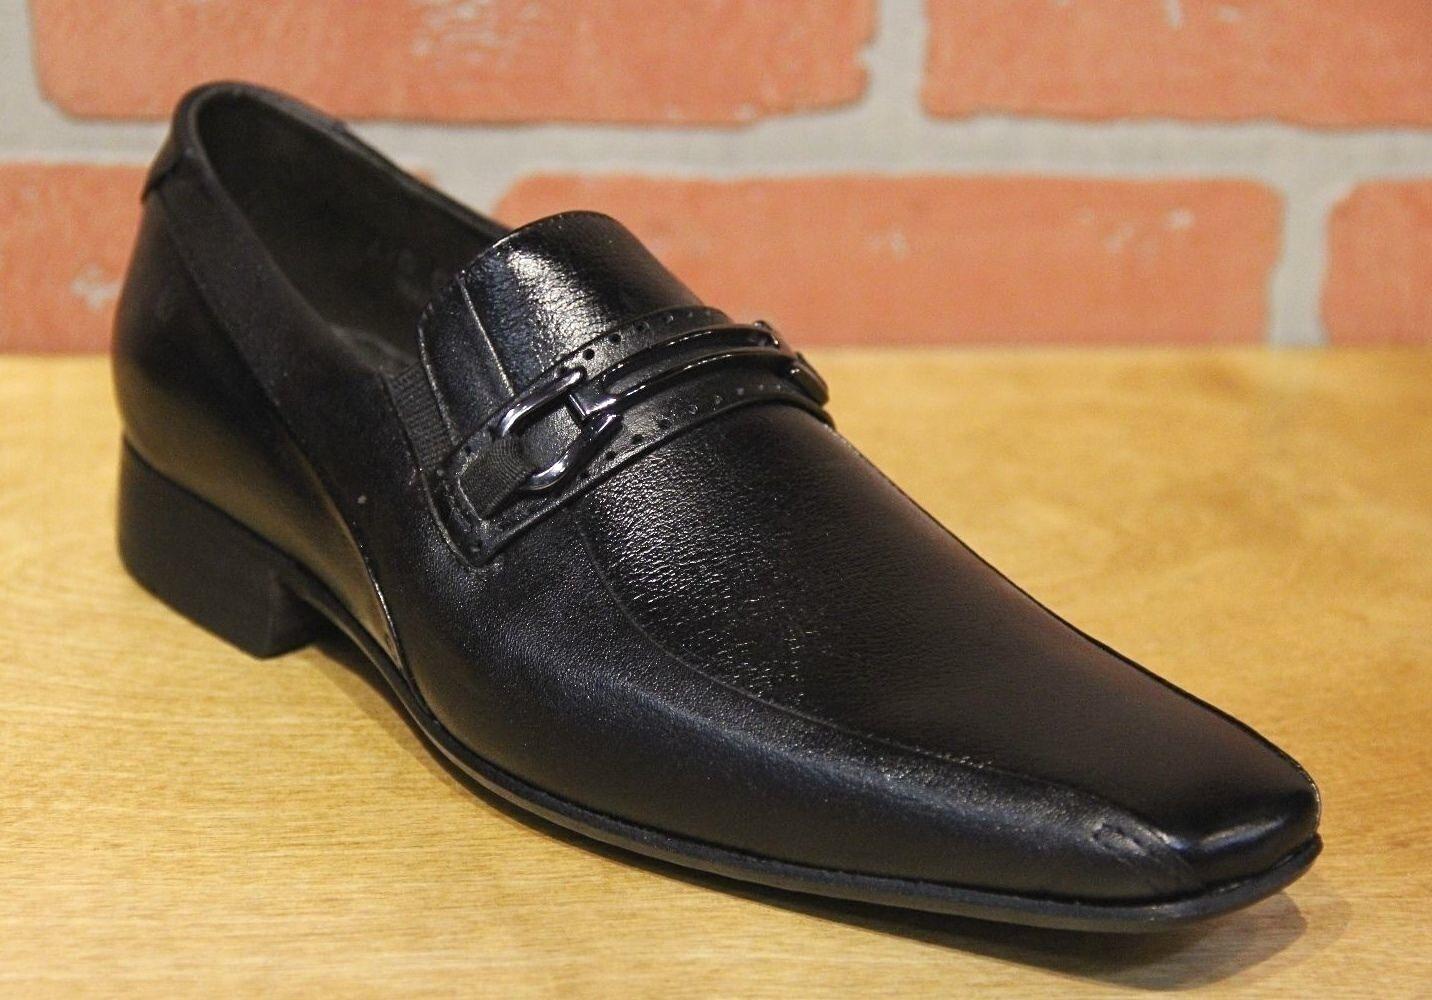 Alfredo Men's Black Leather Slip On Dress shoes Made in Brazil 0270